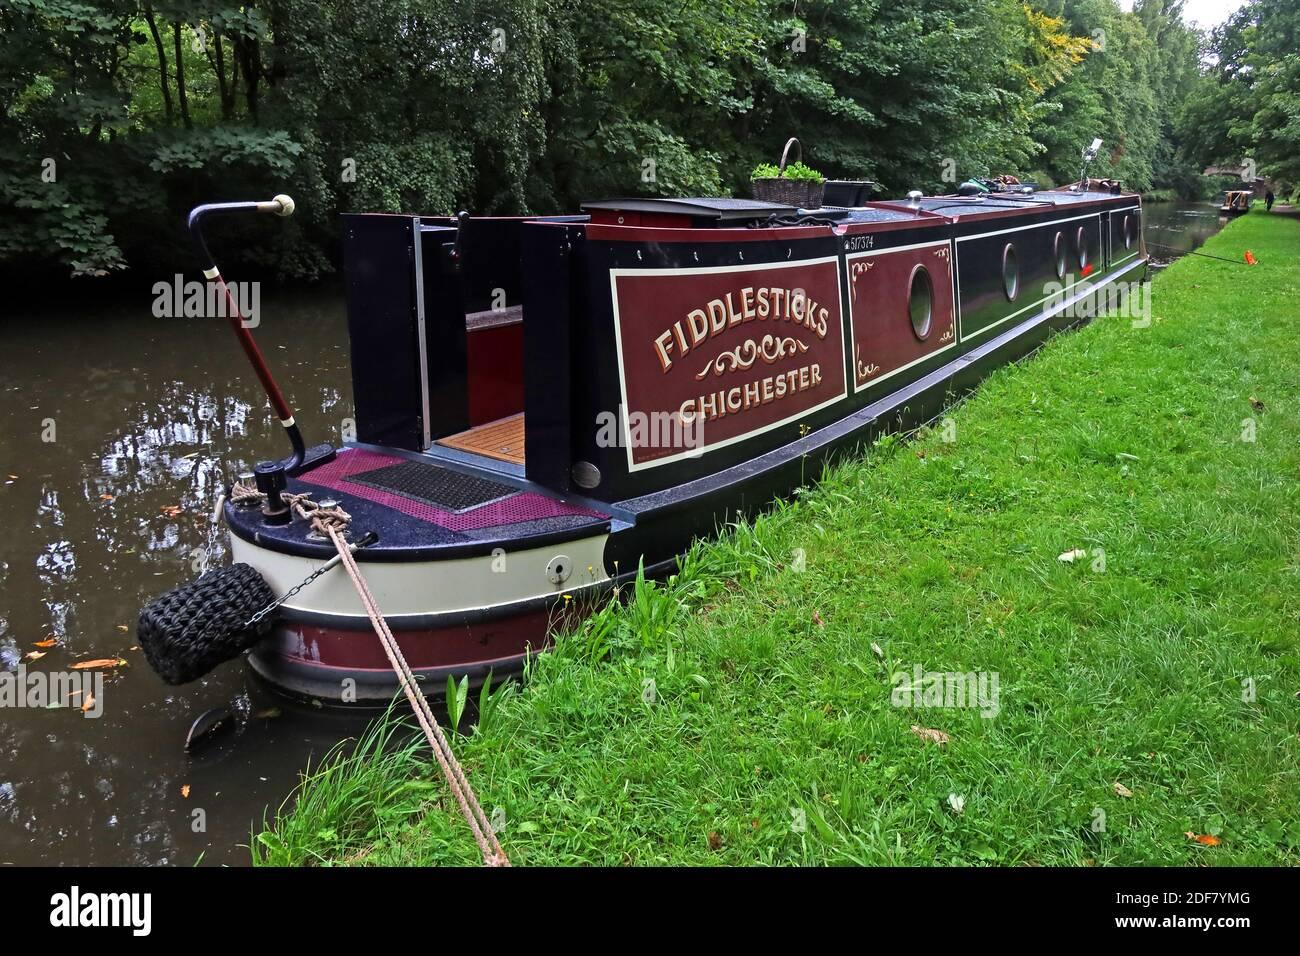 HotpixUK,@HotpixUK,GoTonySmith,England,UK,Warrington,Cheshire,canal,waterways,canalboat,British canal,Walton,@Hotpixuk,Hotpixuk,waterway,narrowboat,boat,WA4,towpath,waterside,Bridgewater Canal,517374,moored up boat,Walton village